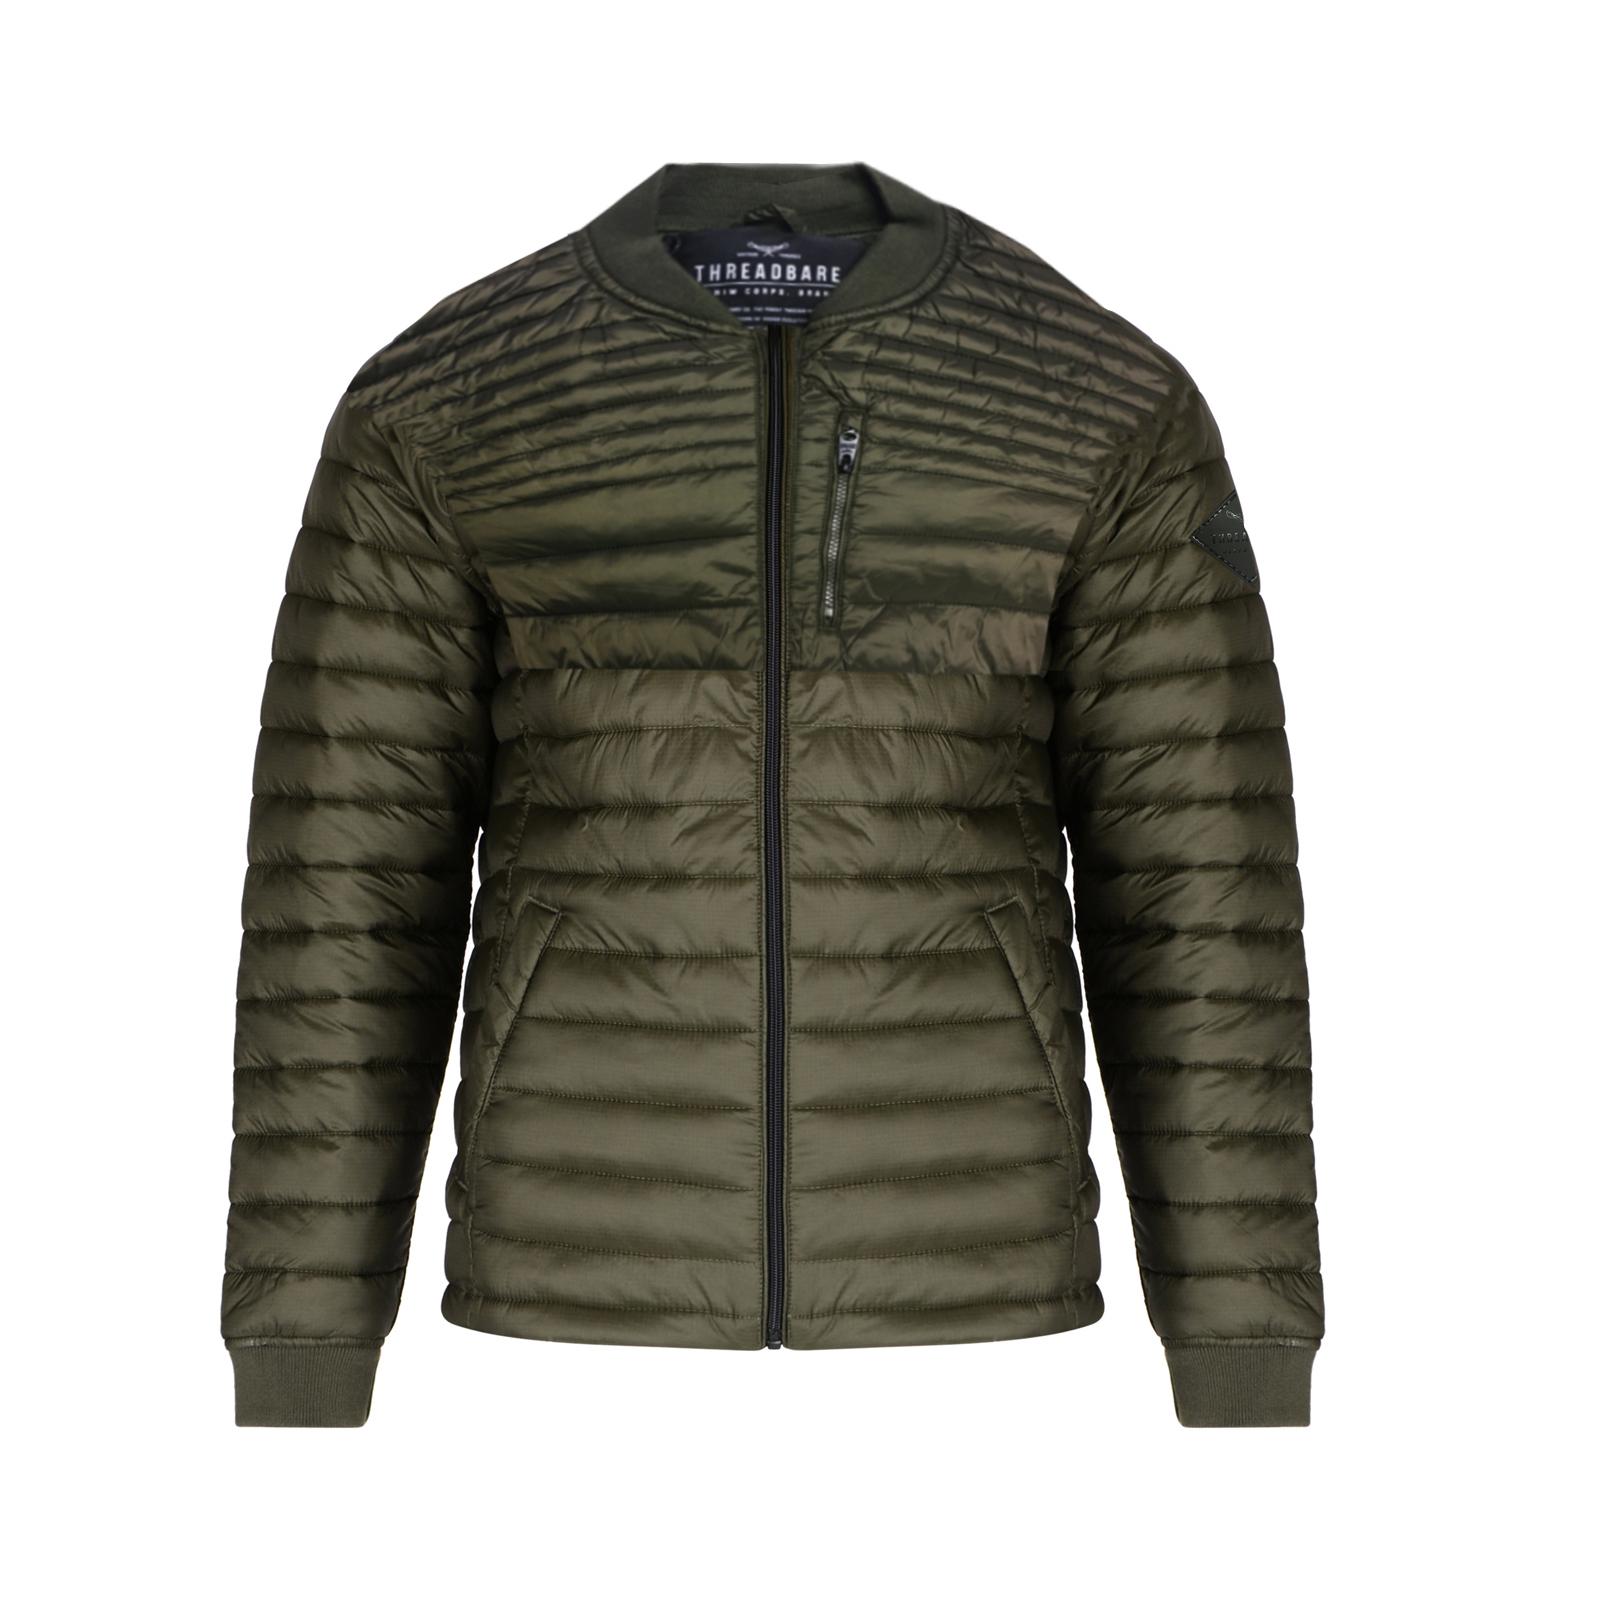 Threadbare-Mens-Naples-MA1-Bomber-Jacket-Designer-Quilted-Winter-Padded-Coat thumbnail 4